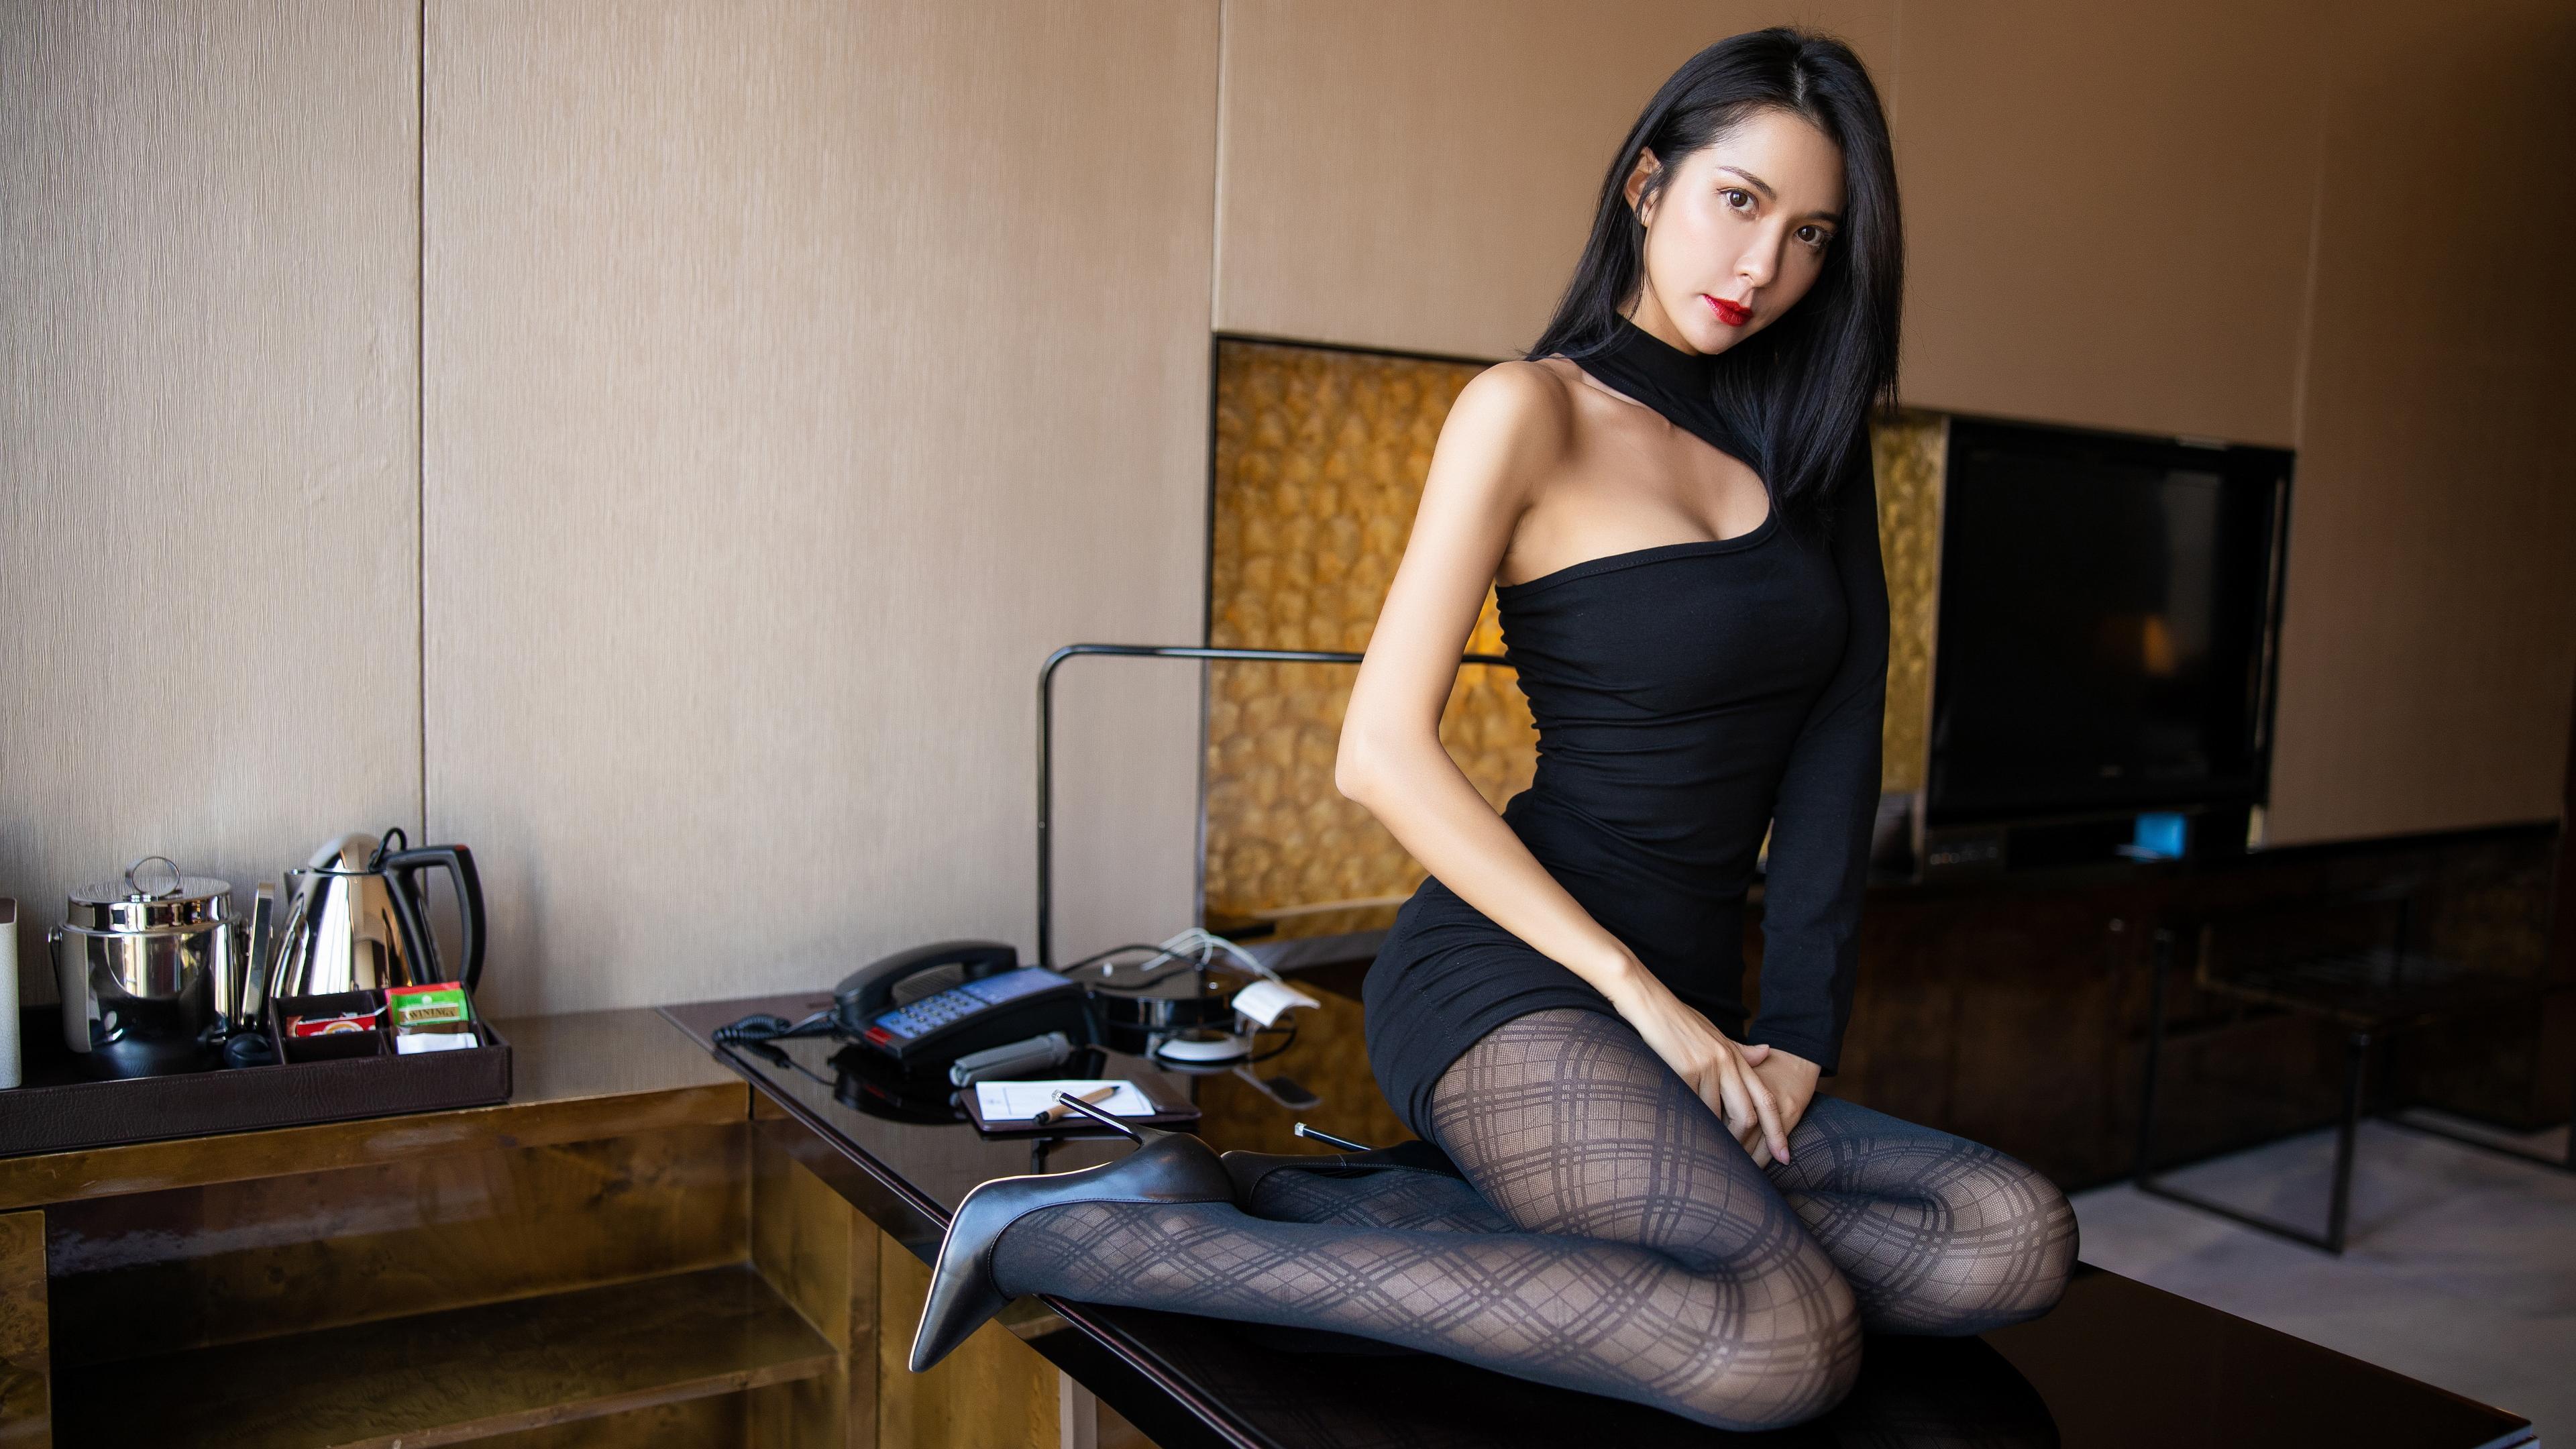 Asian, model, long hair, Chinese, Chinese model, legs